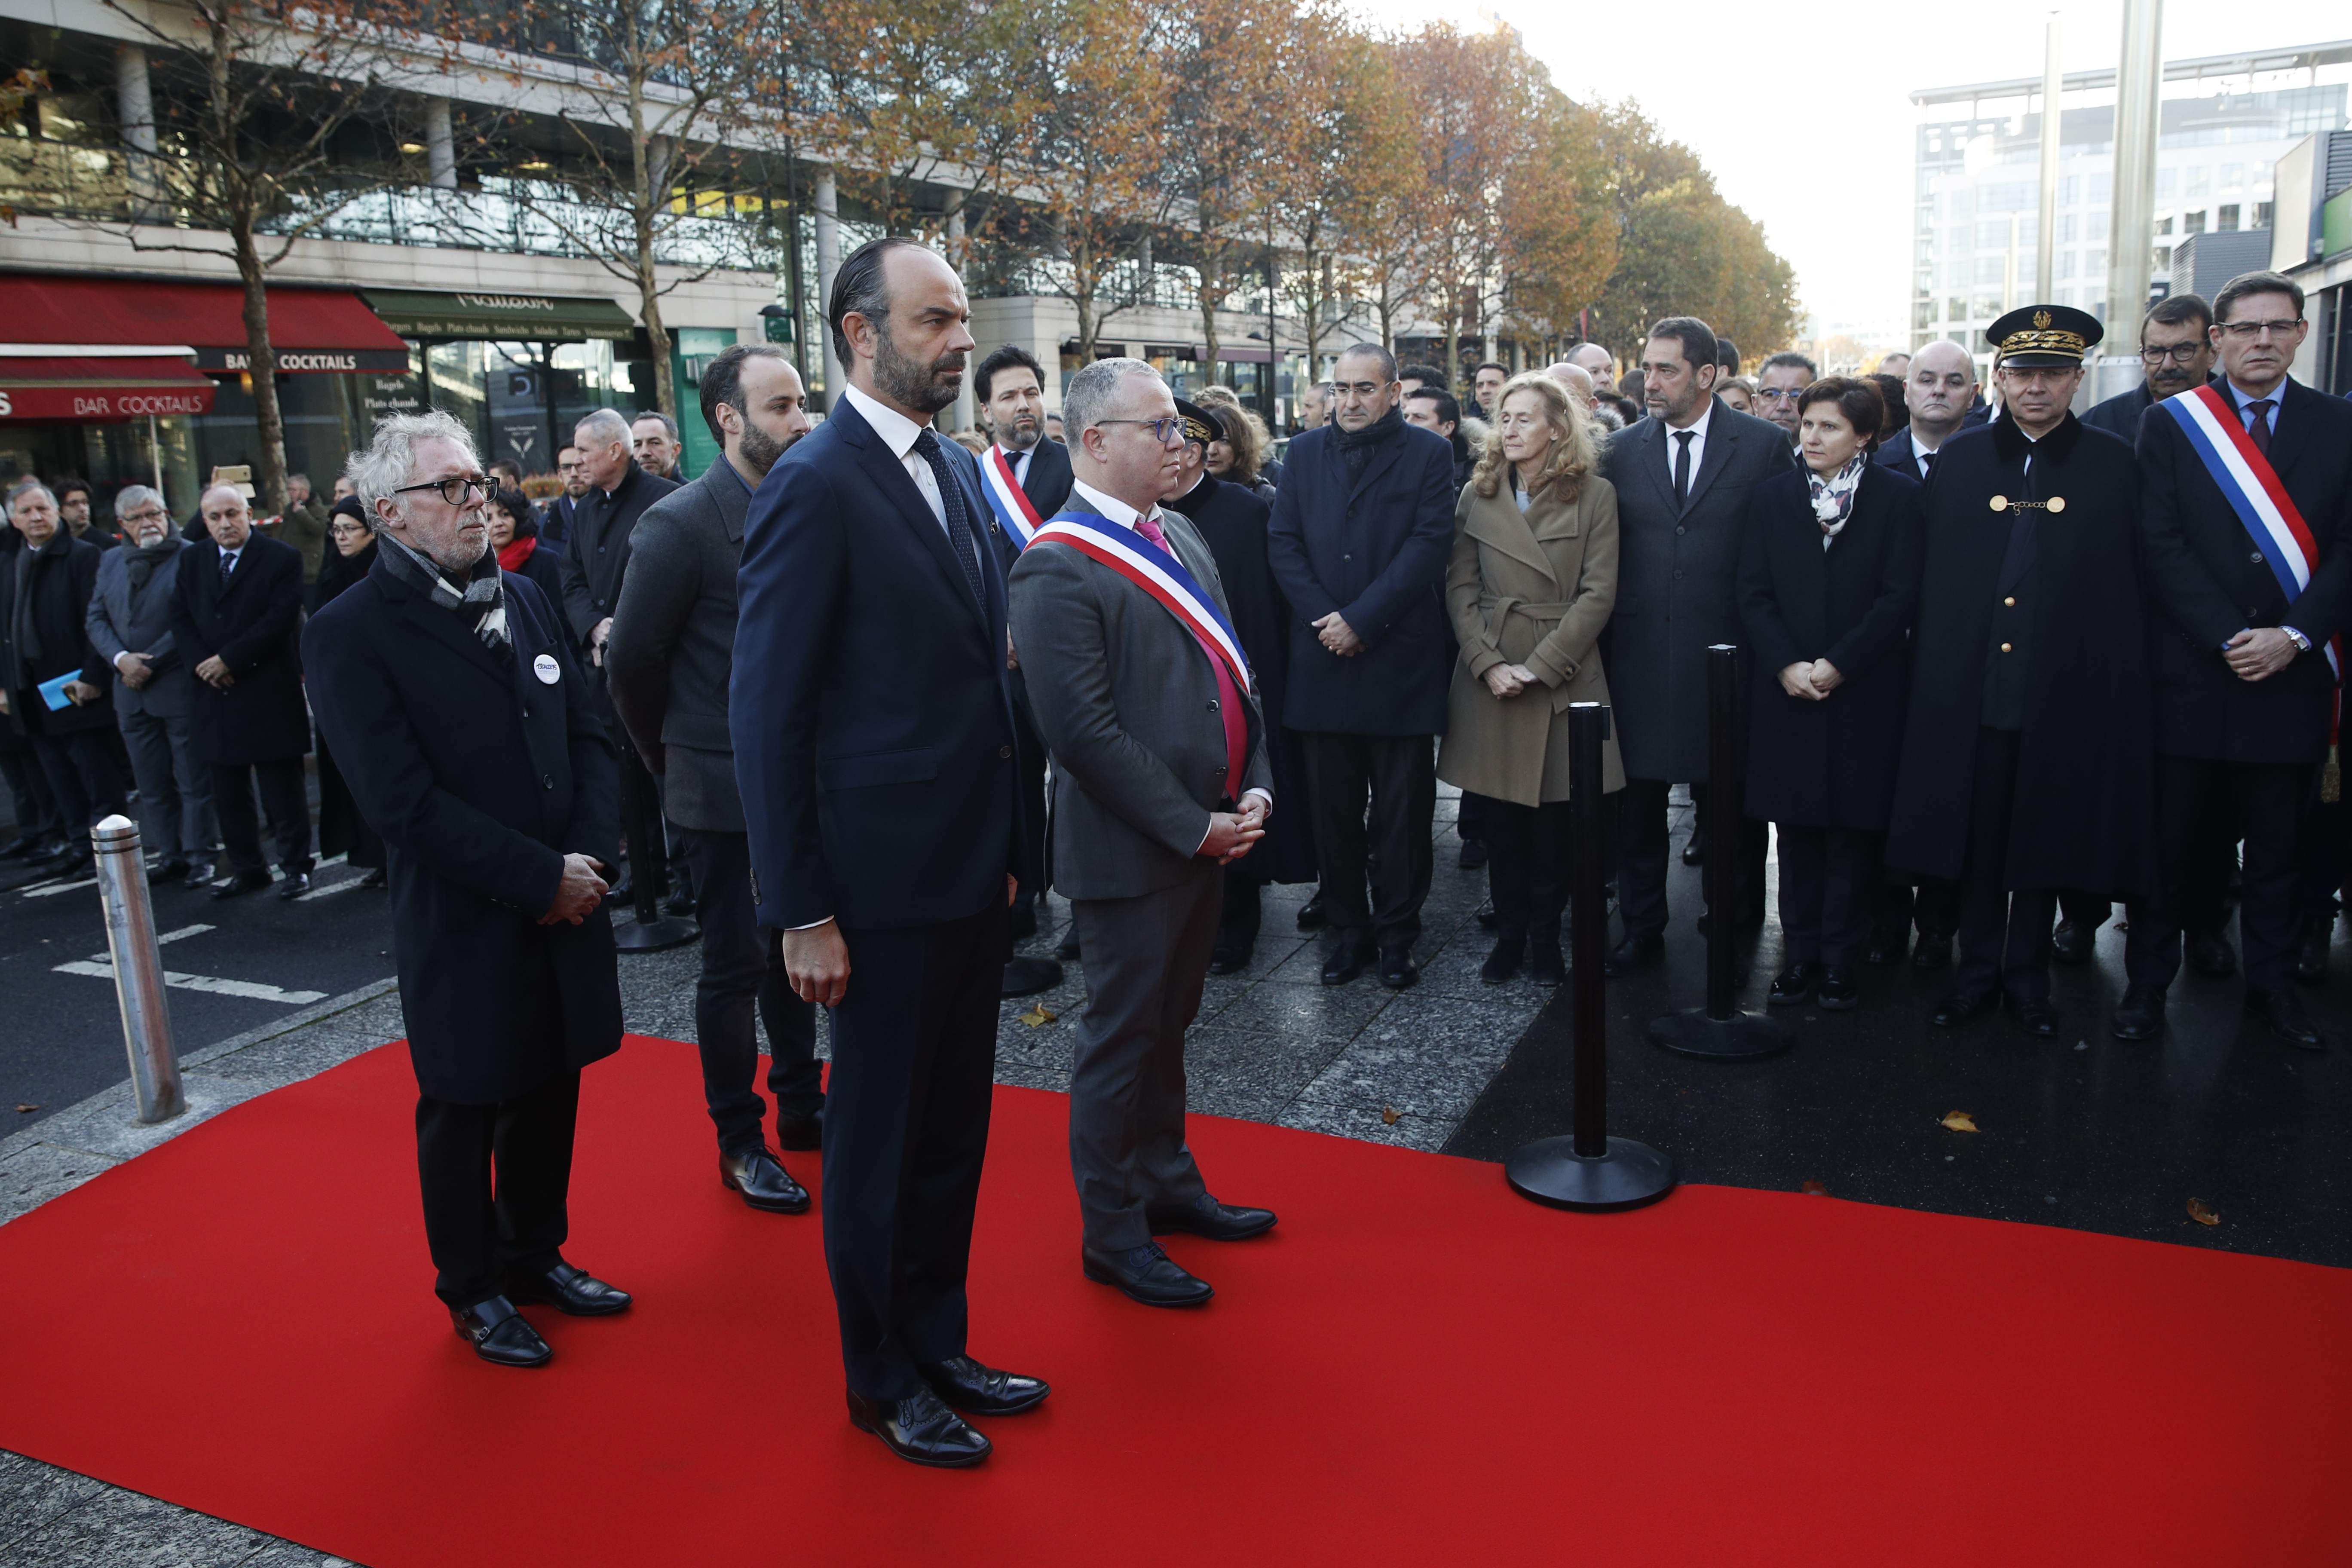 Football - Equipe de France - Attentats du 13 novembre : Edouard Philippe rend hommage à la victime du Stade de France